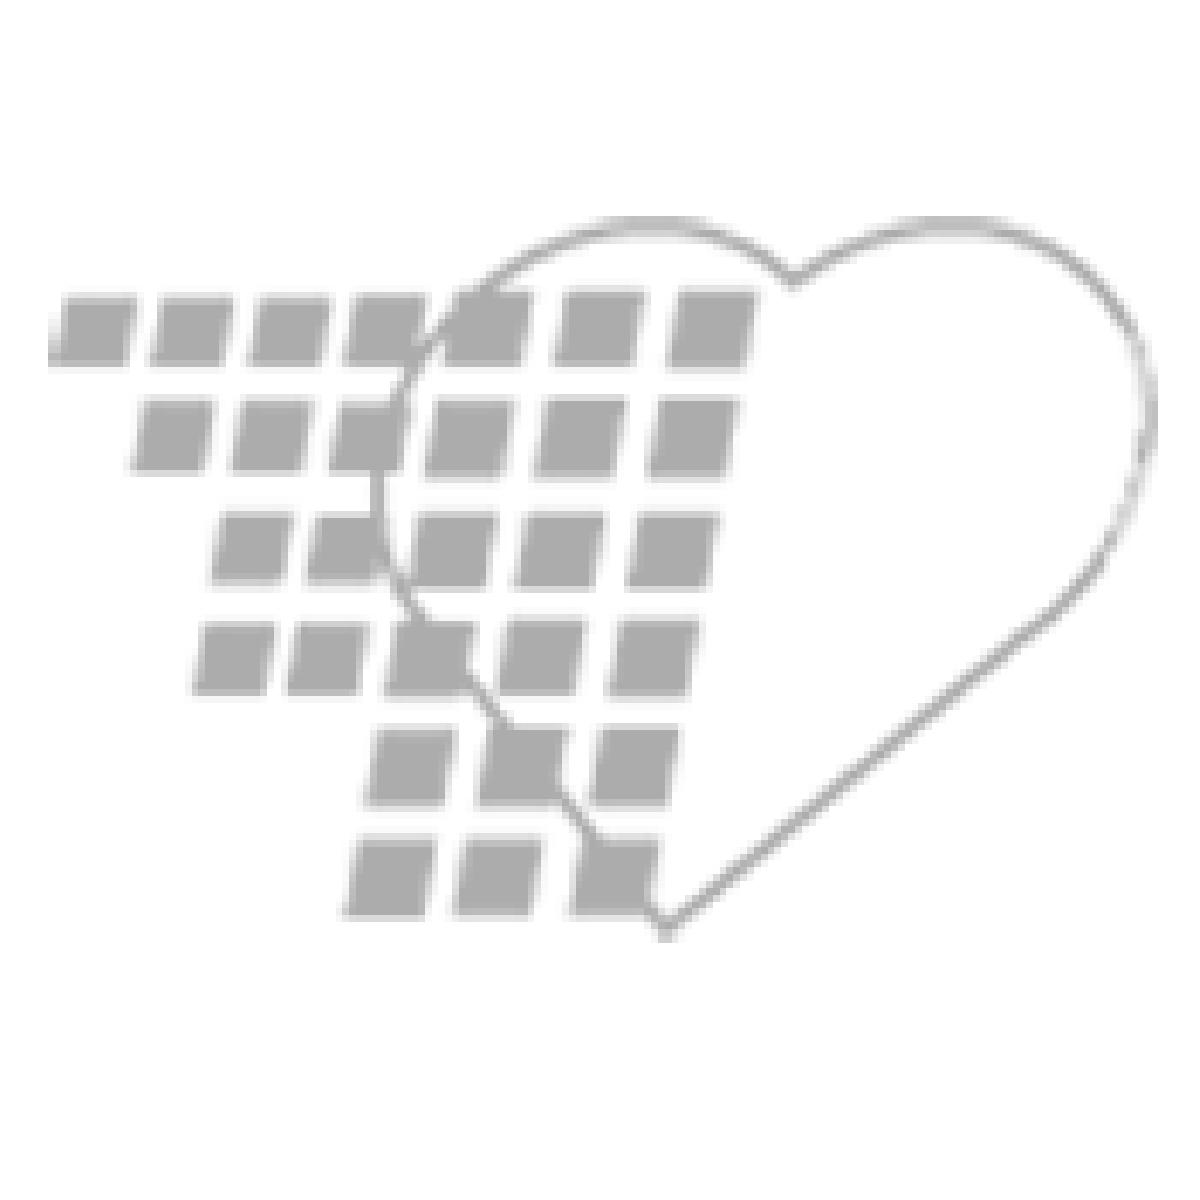 02-40-1603 - SONIMAGER P3 - Handheld Ultrasound Device